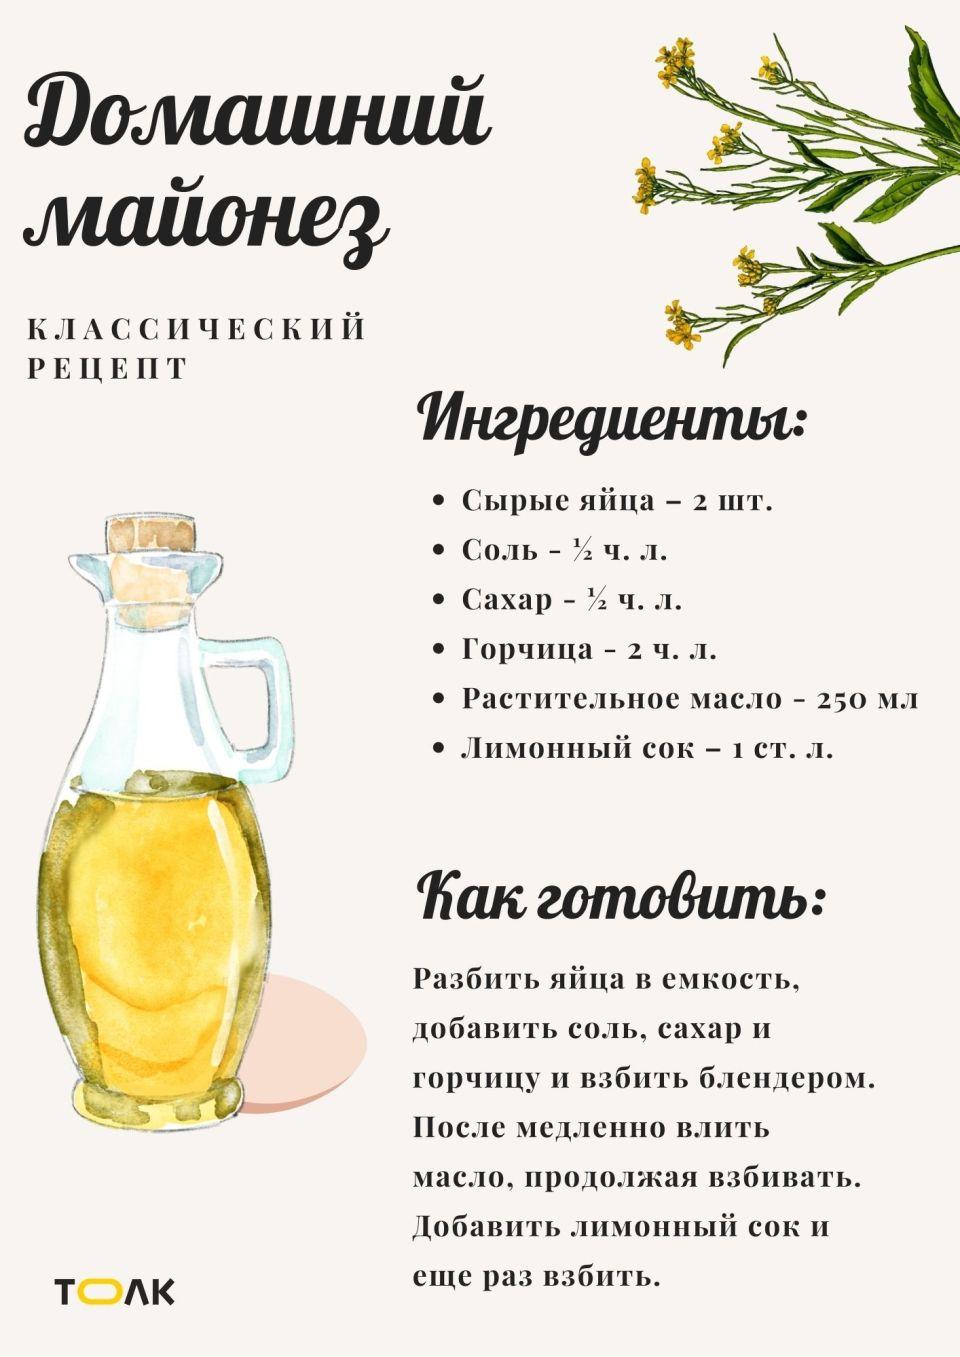 Рецепт майонеза